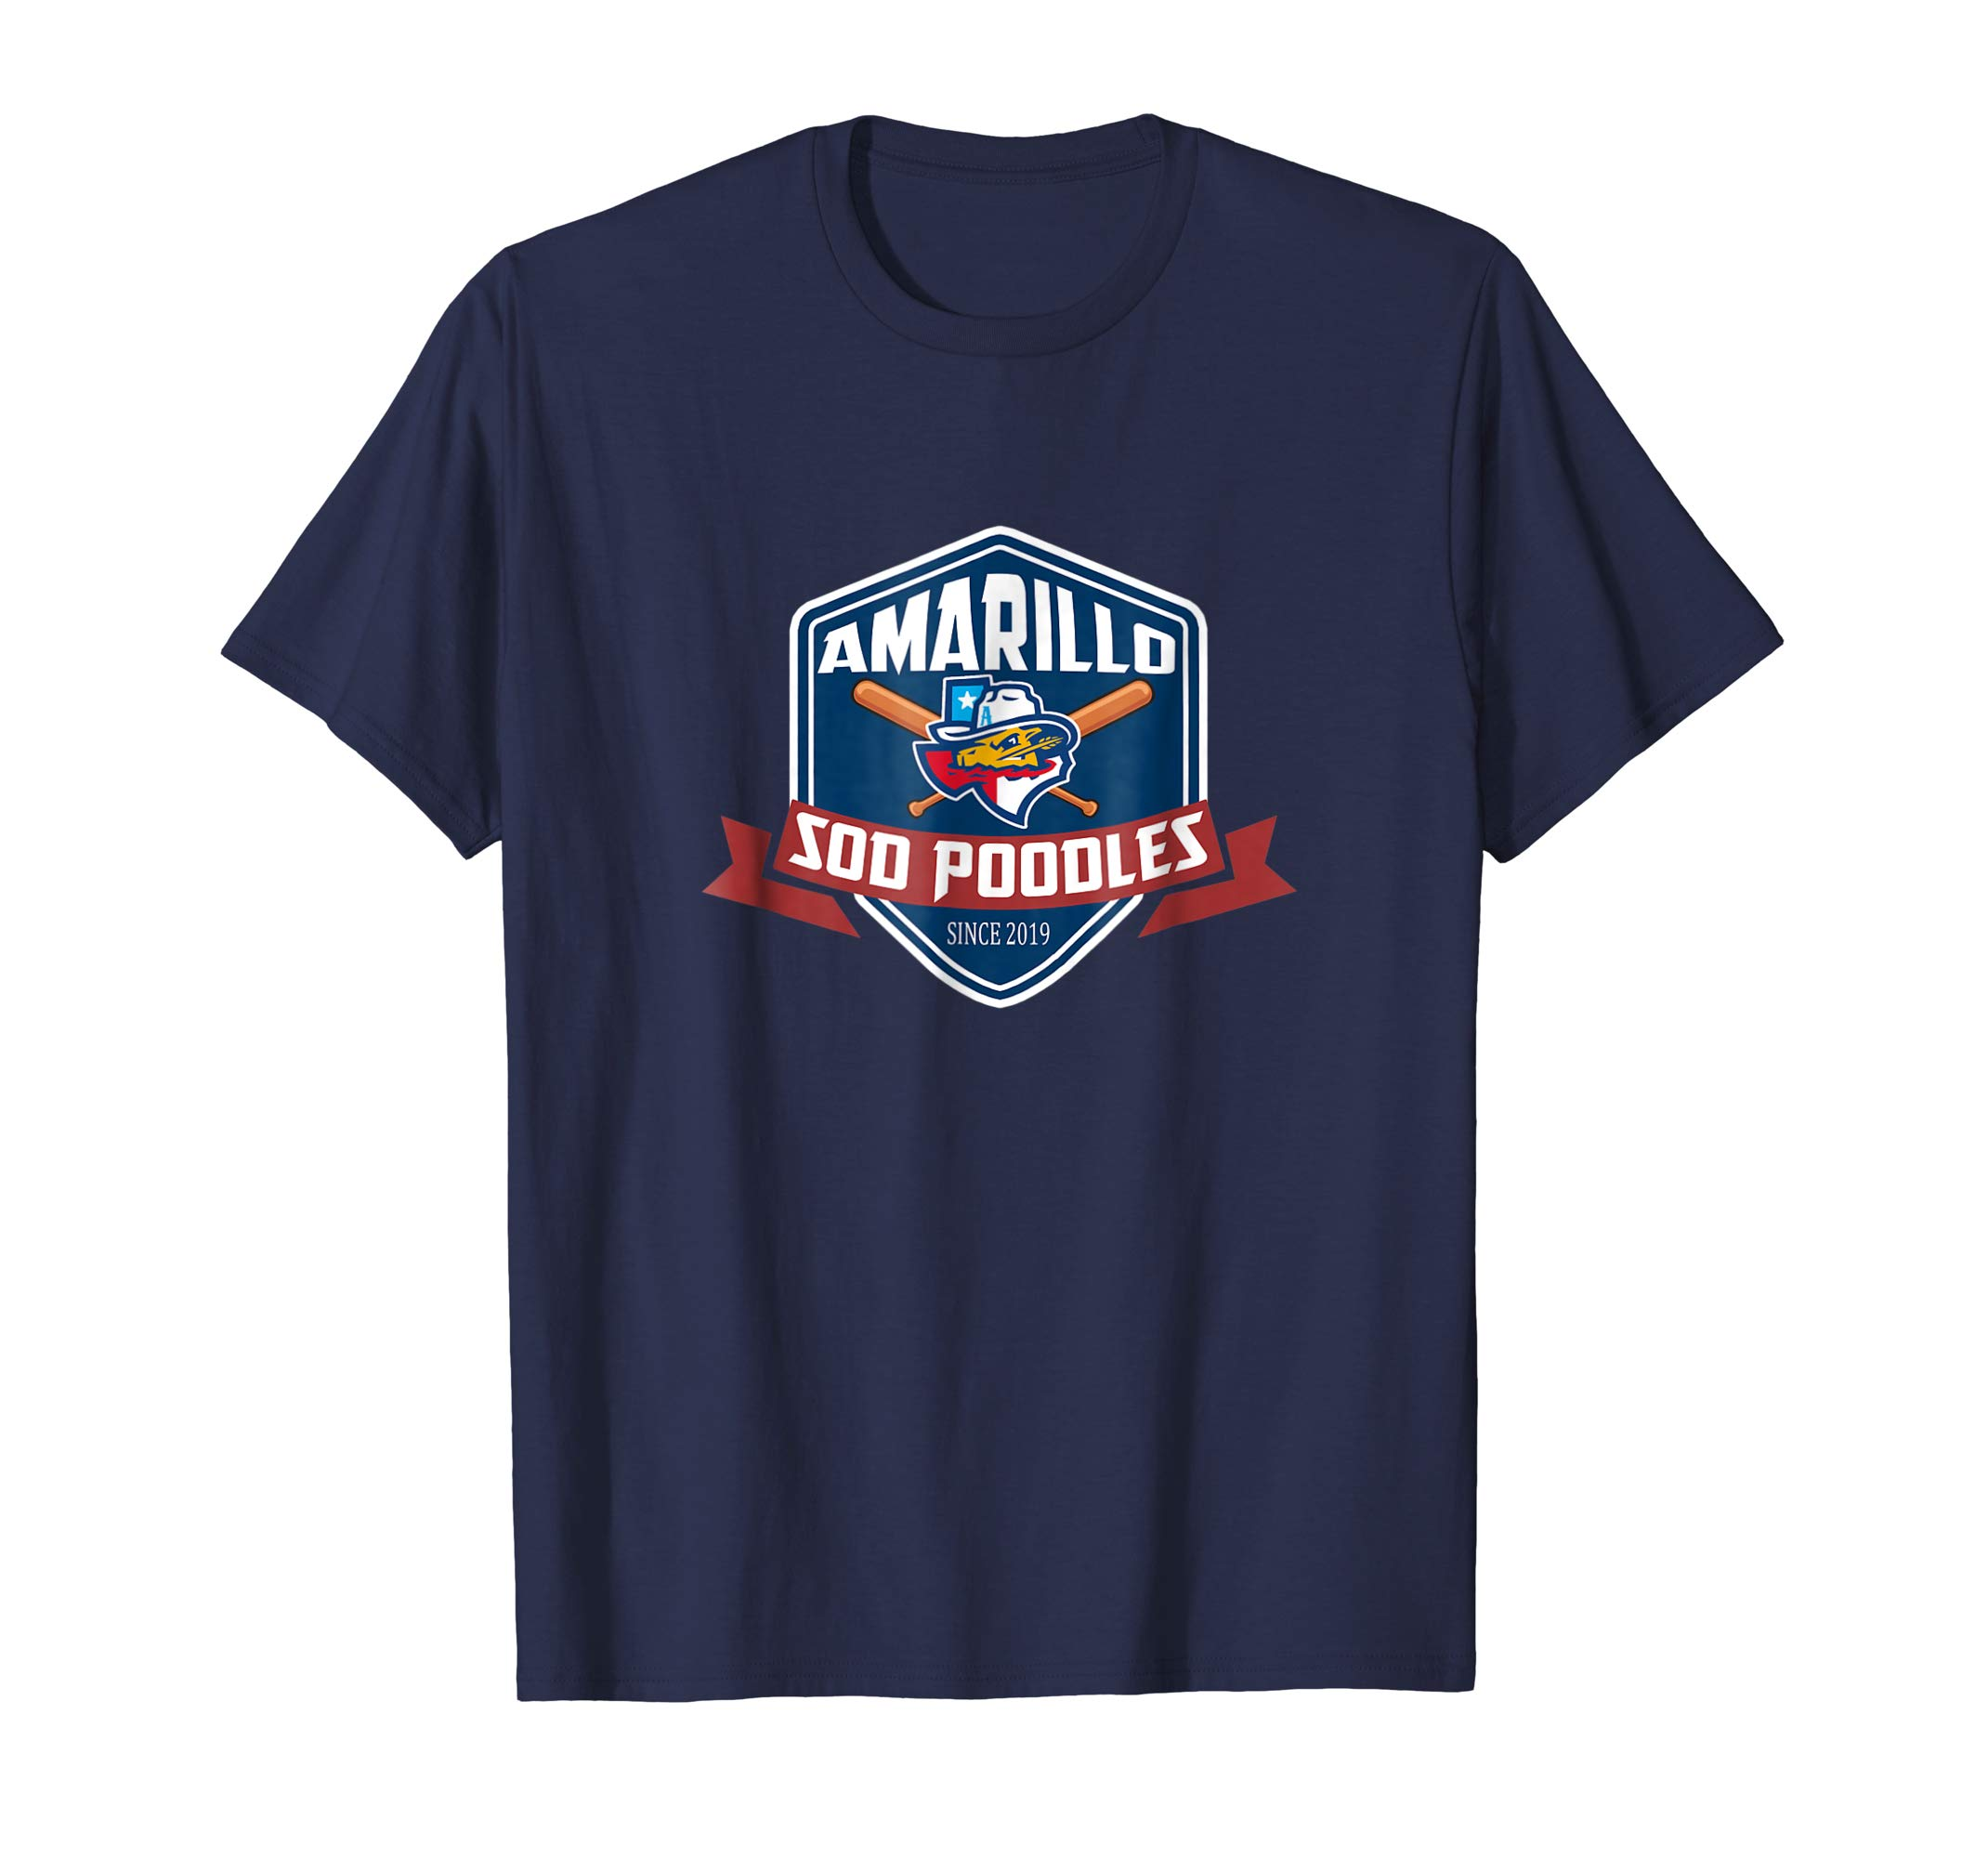 Amarillo Sod Poodles T Shirt New Baseball Team-azvn